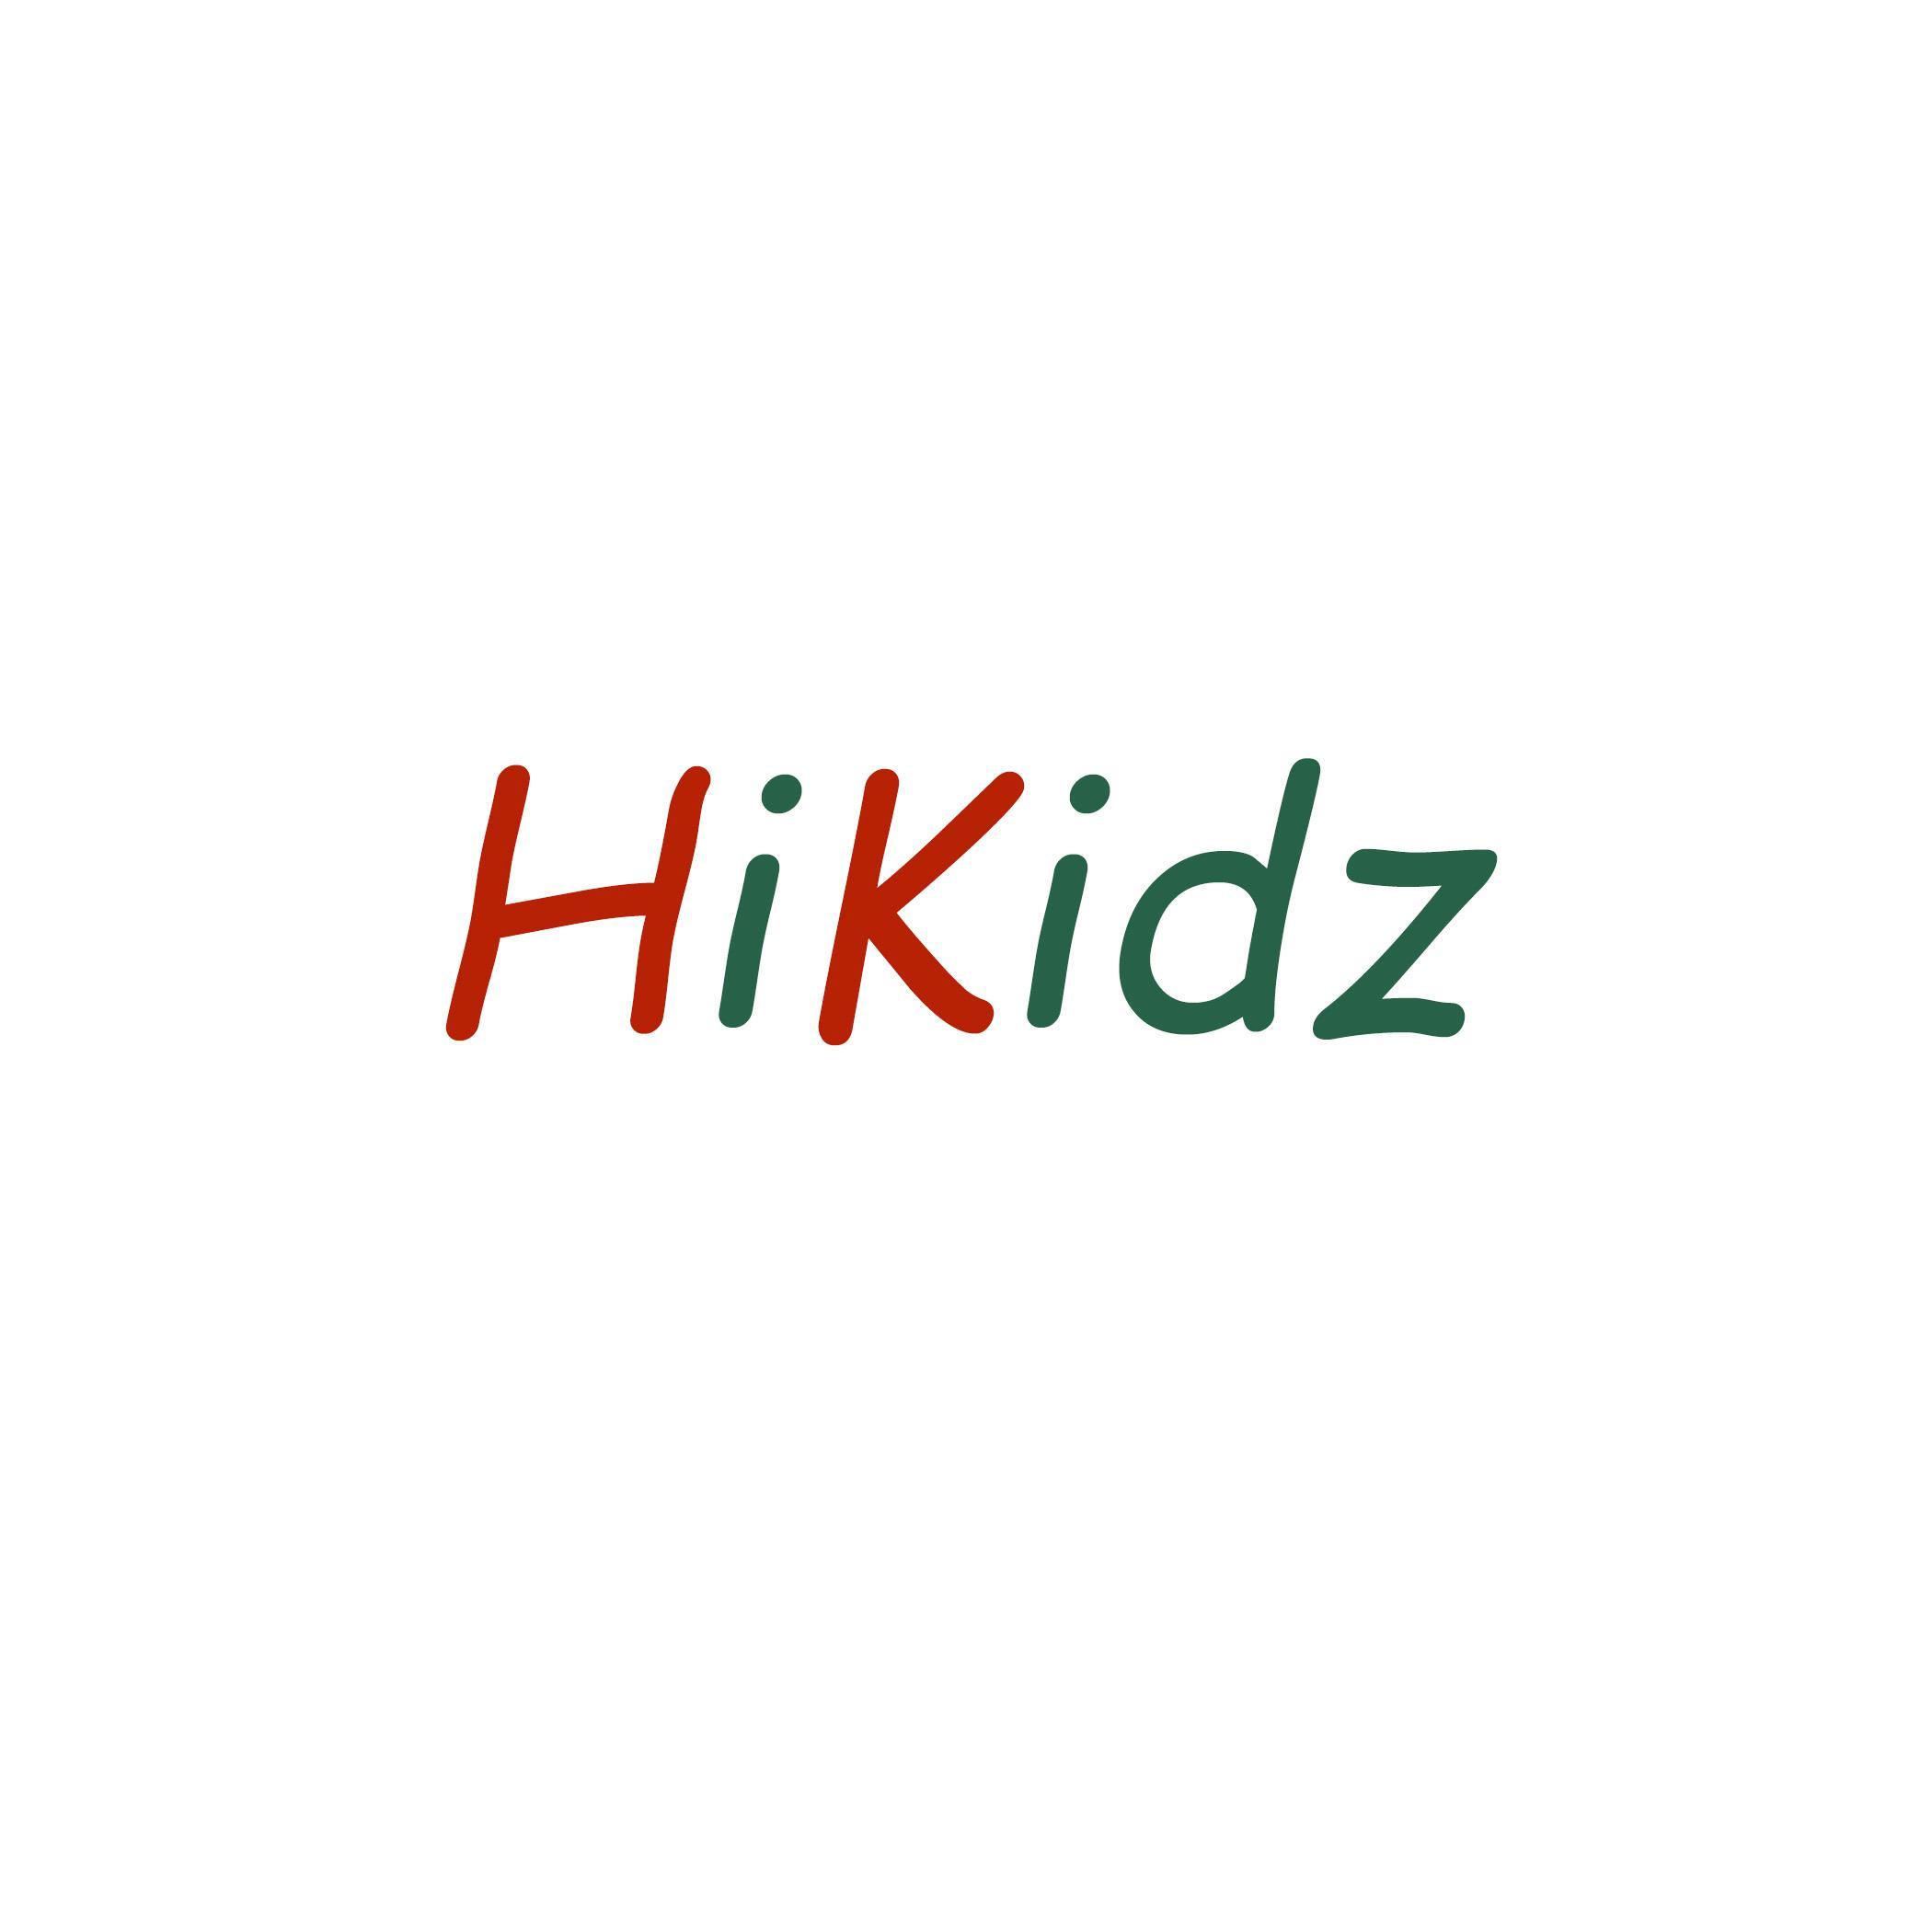 HiKidz, Hikidz